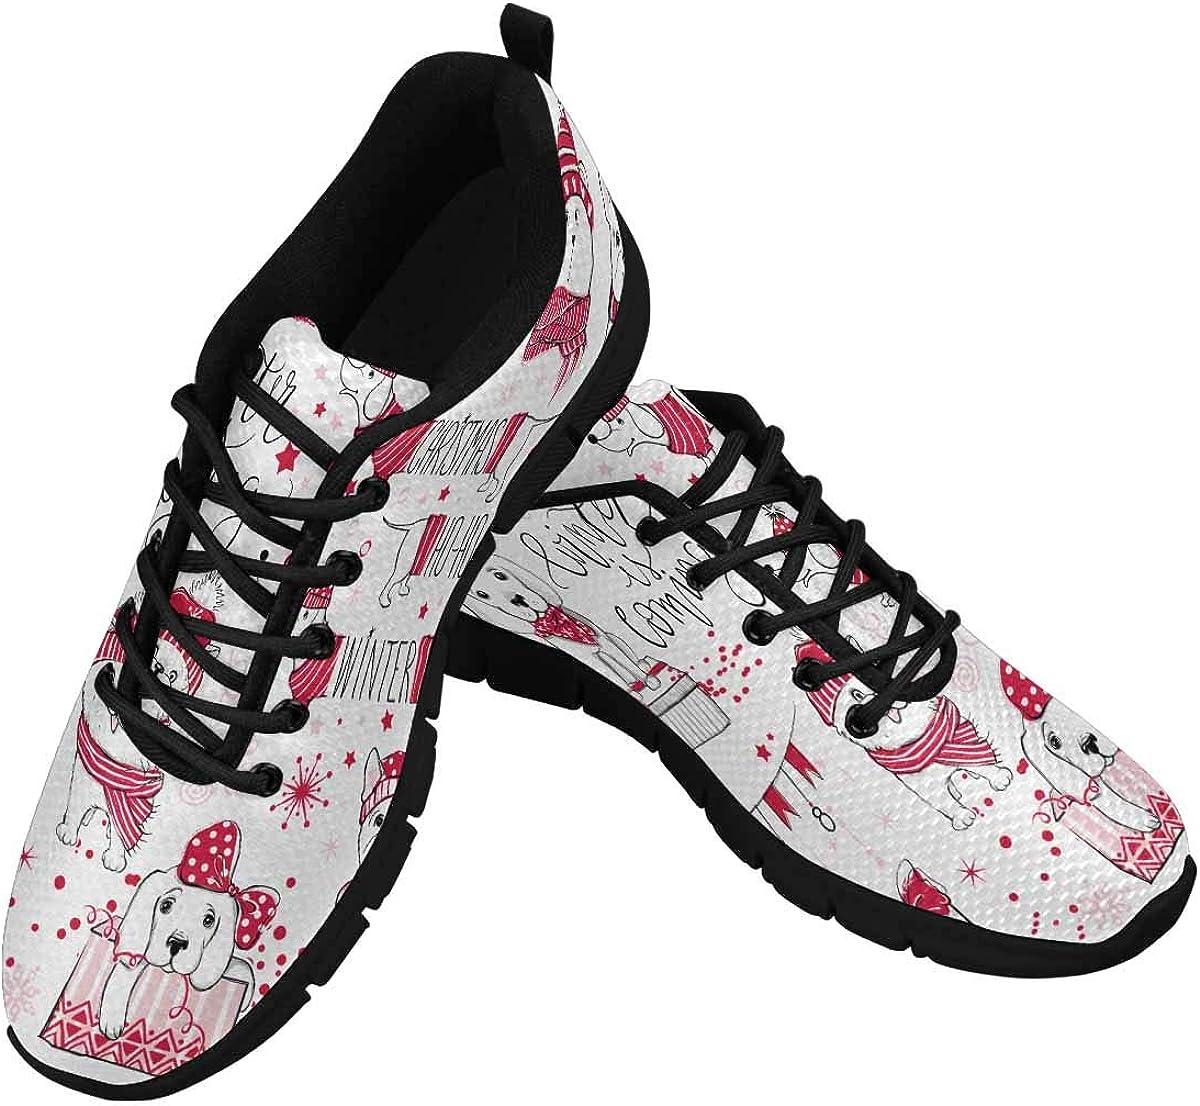 InterestPrint Cartoon Animals Xmas 2018 Women's Athletic Walking Shoes Comfort Mesh Non Slip